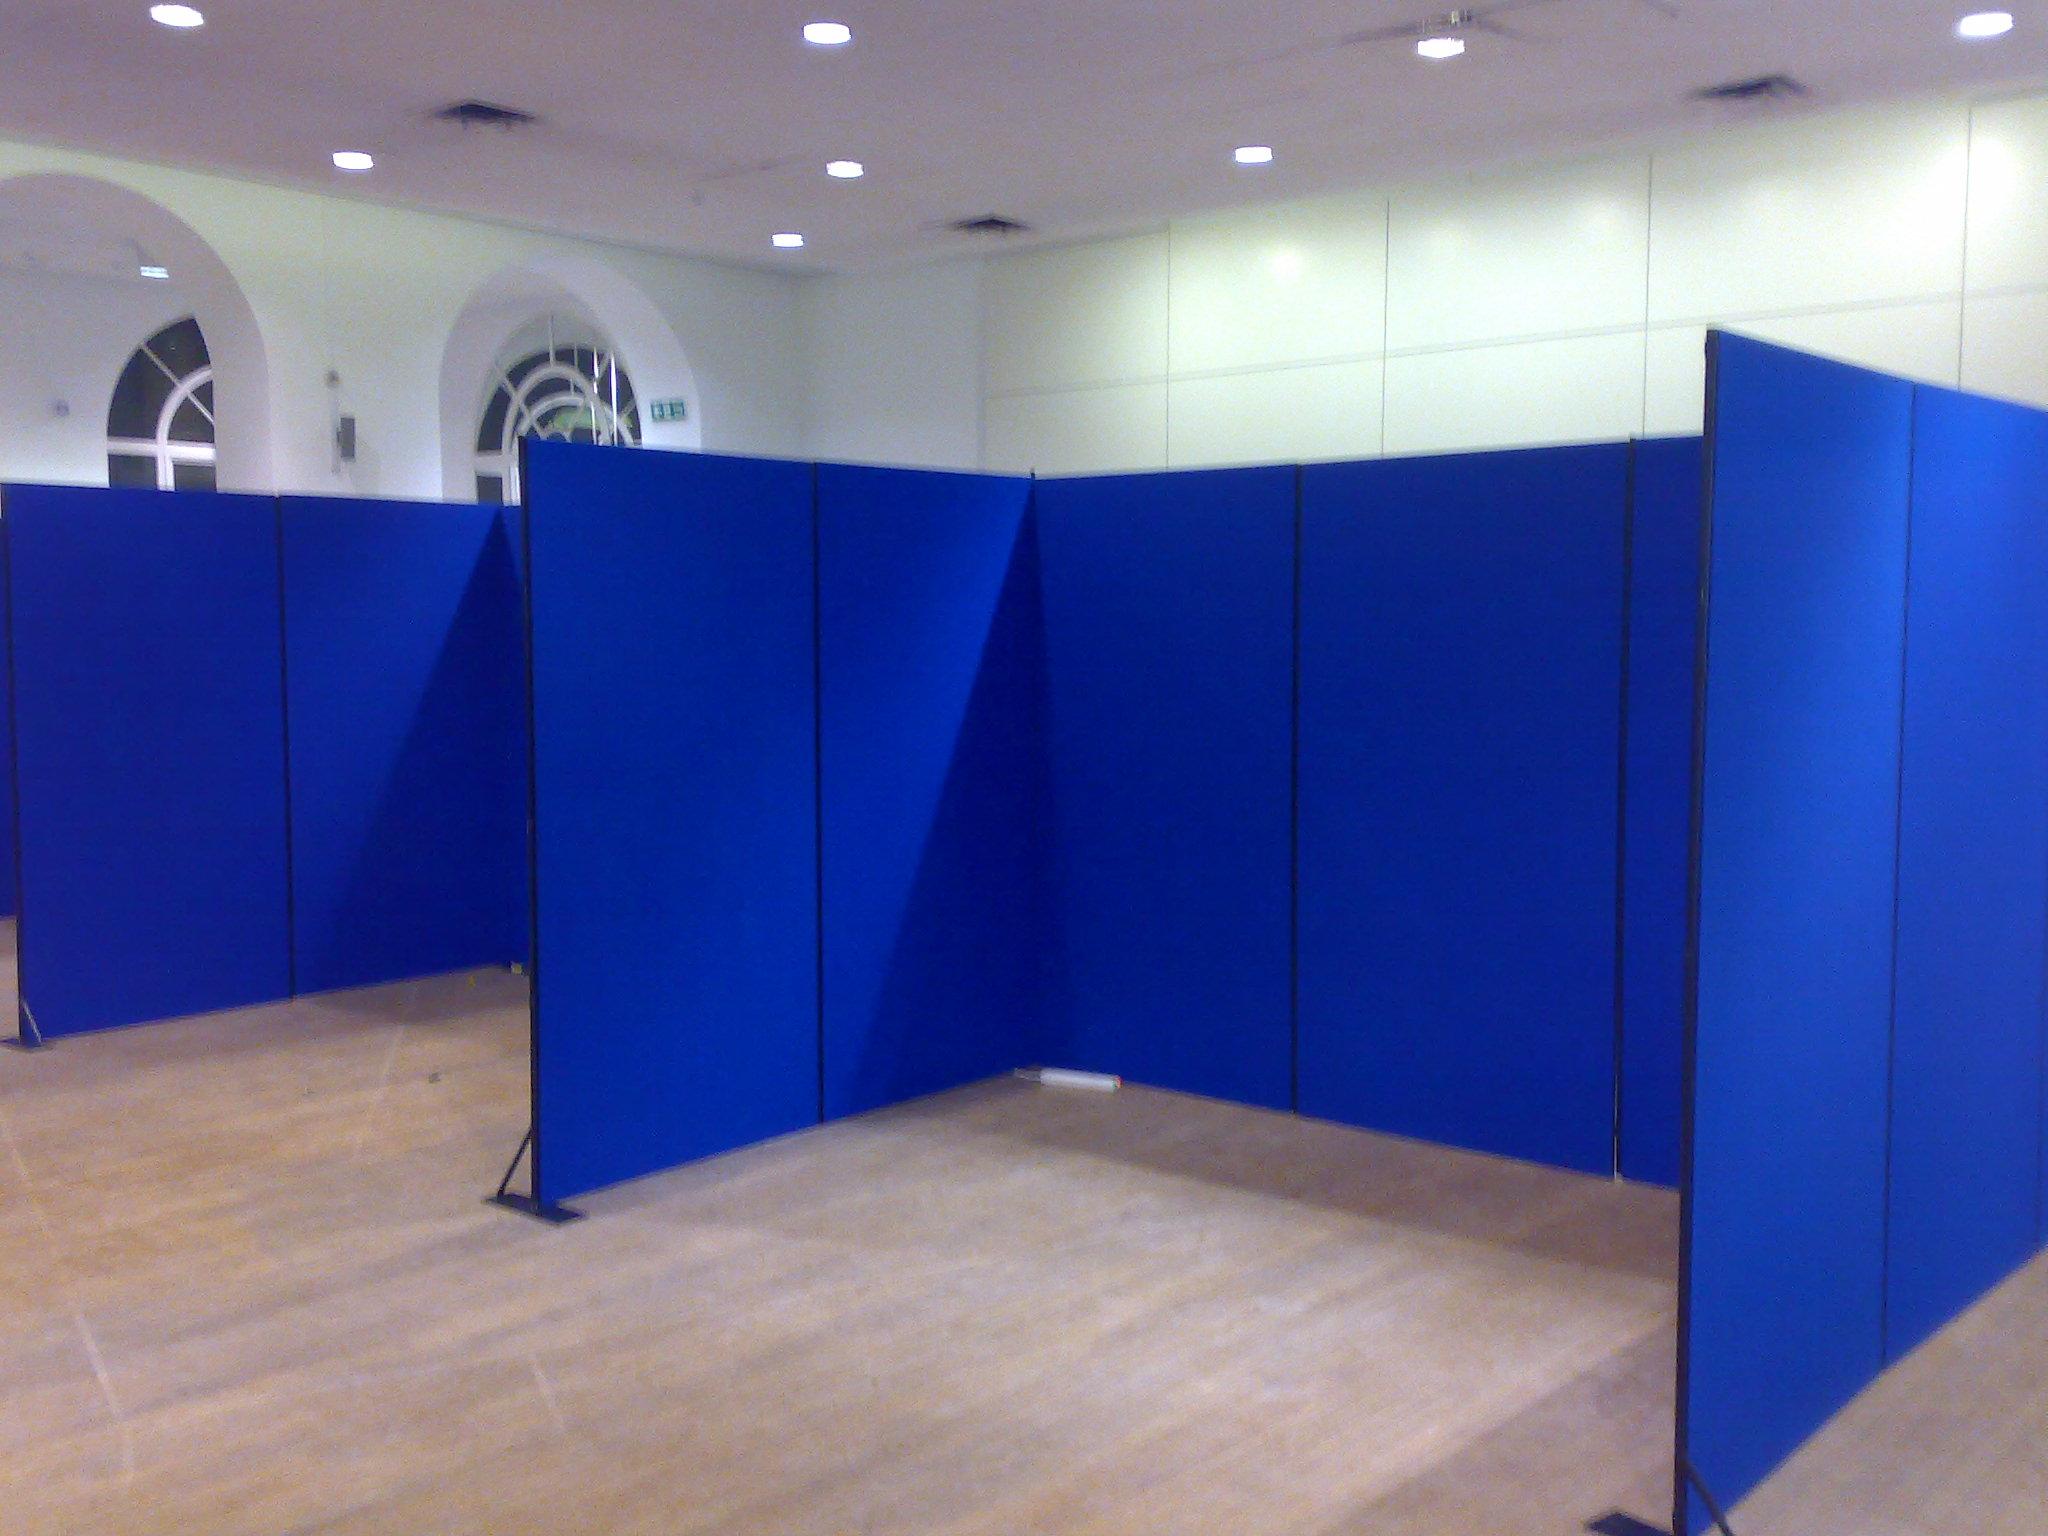 Exhibition Booth Standard Shell Scheme : Panel & pole shell scheme x hibit